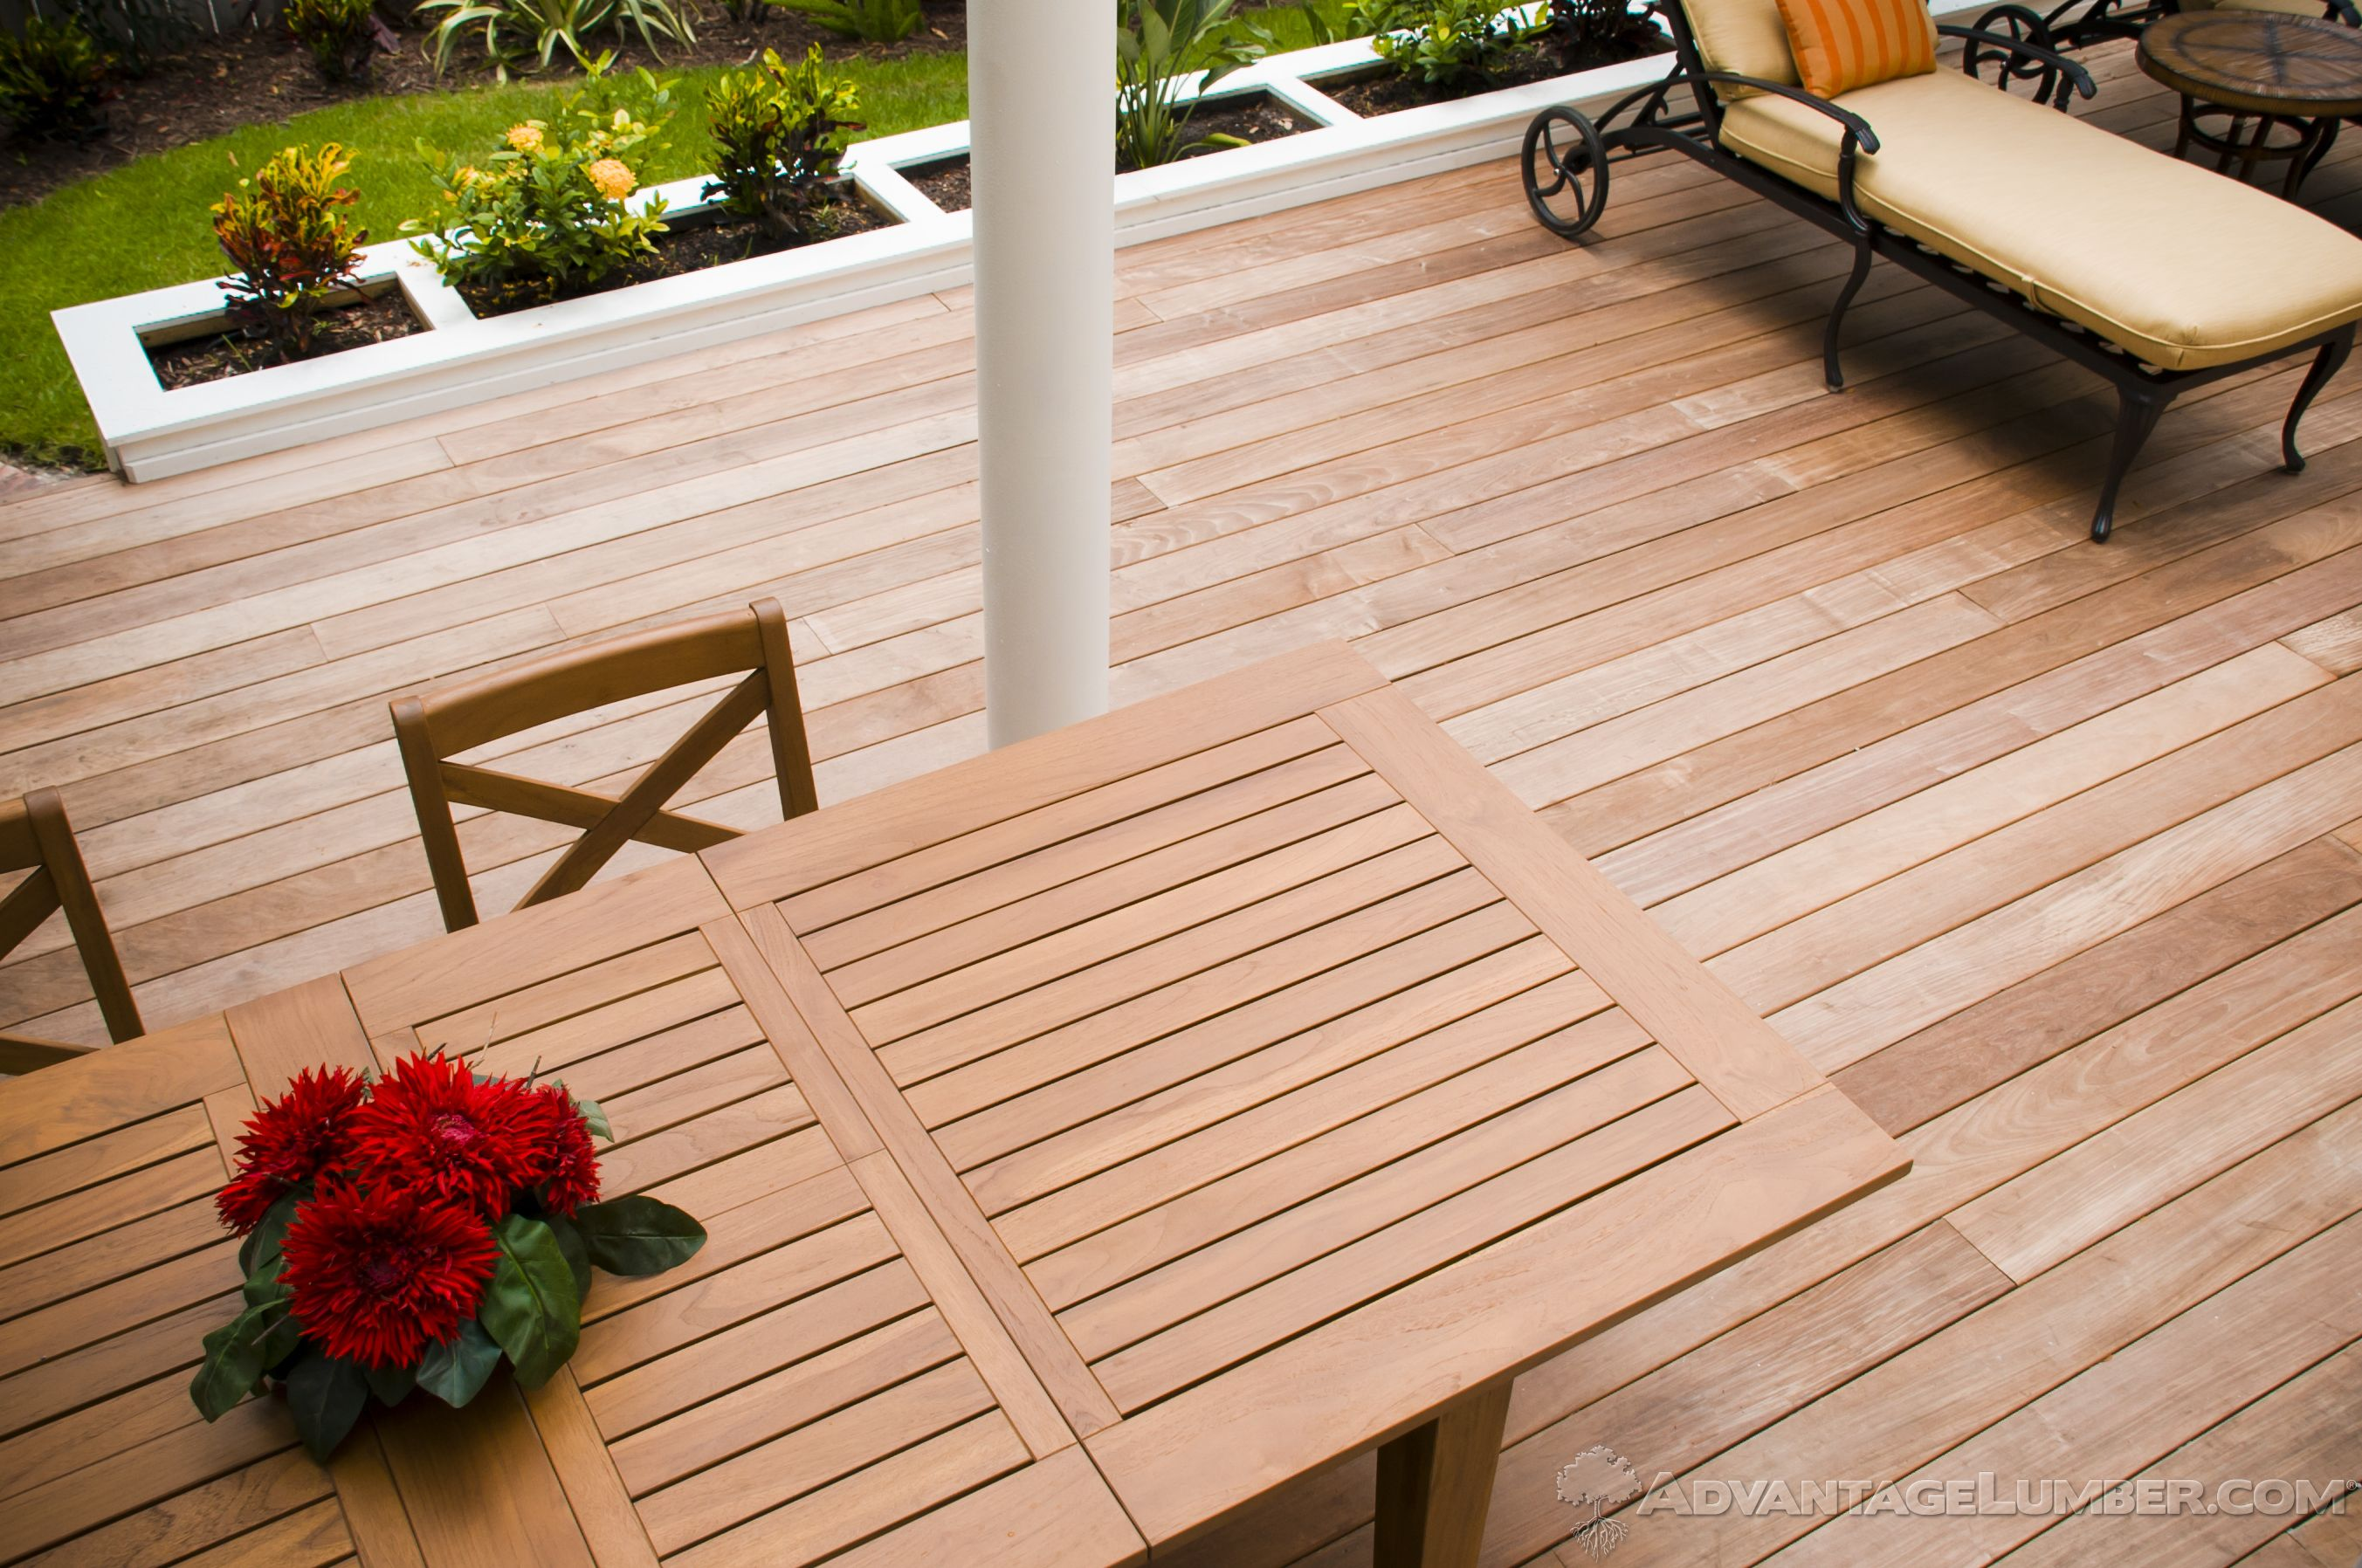 1 X 6 Ipe Wood Decking Ipe Wood Deck Wood Deck Ipe Wood